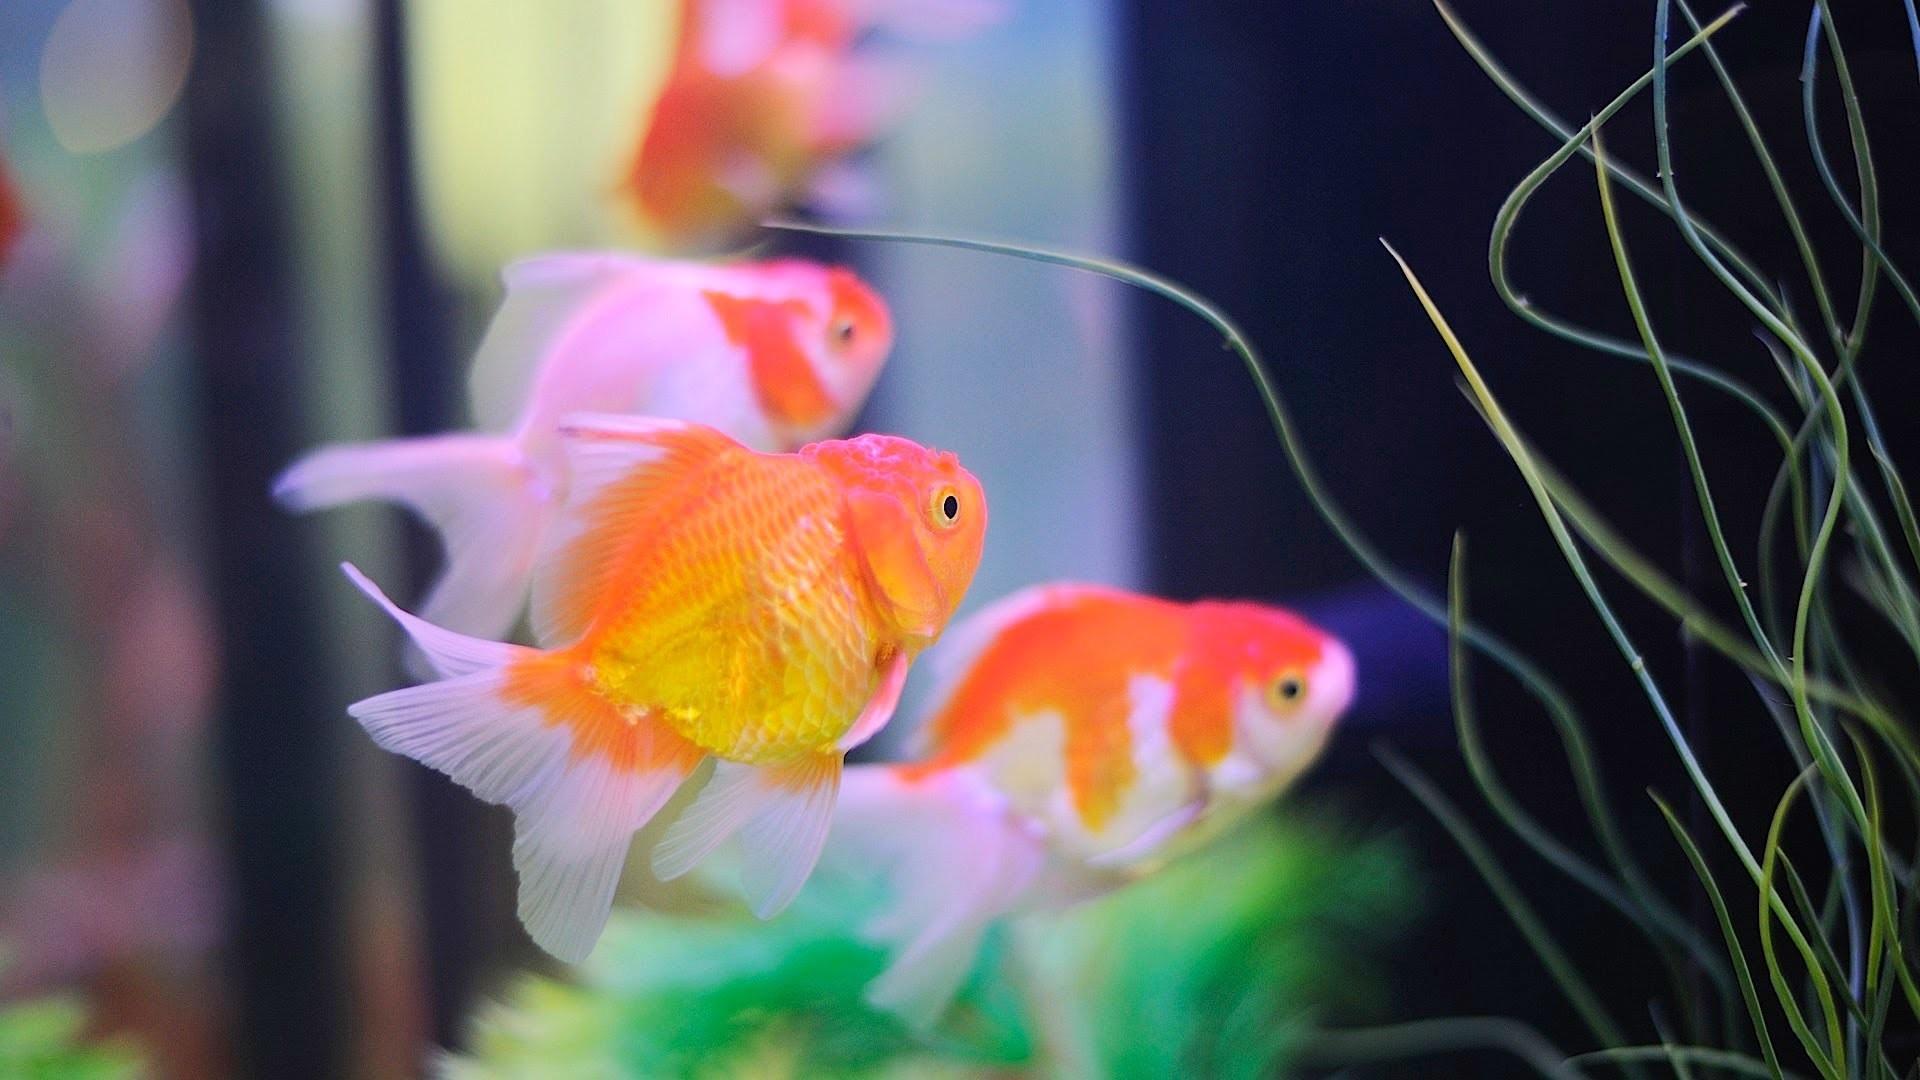 Full Size of Fish Tank Maxresdefault Live Fish Aquarium Singular Photos  Inspirations How To Keep Koi …